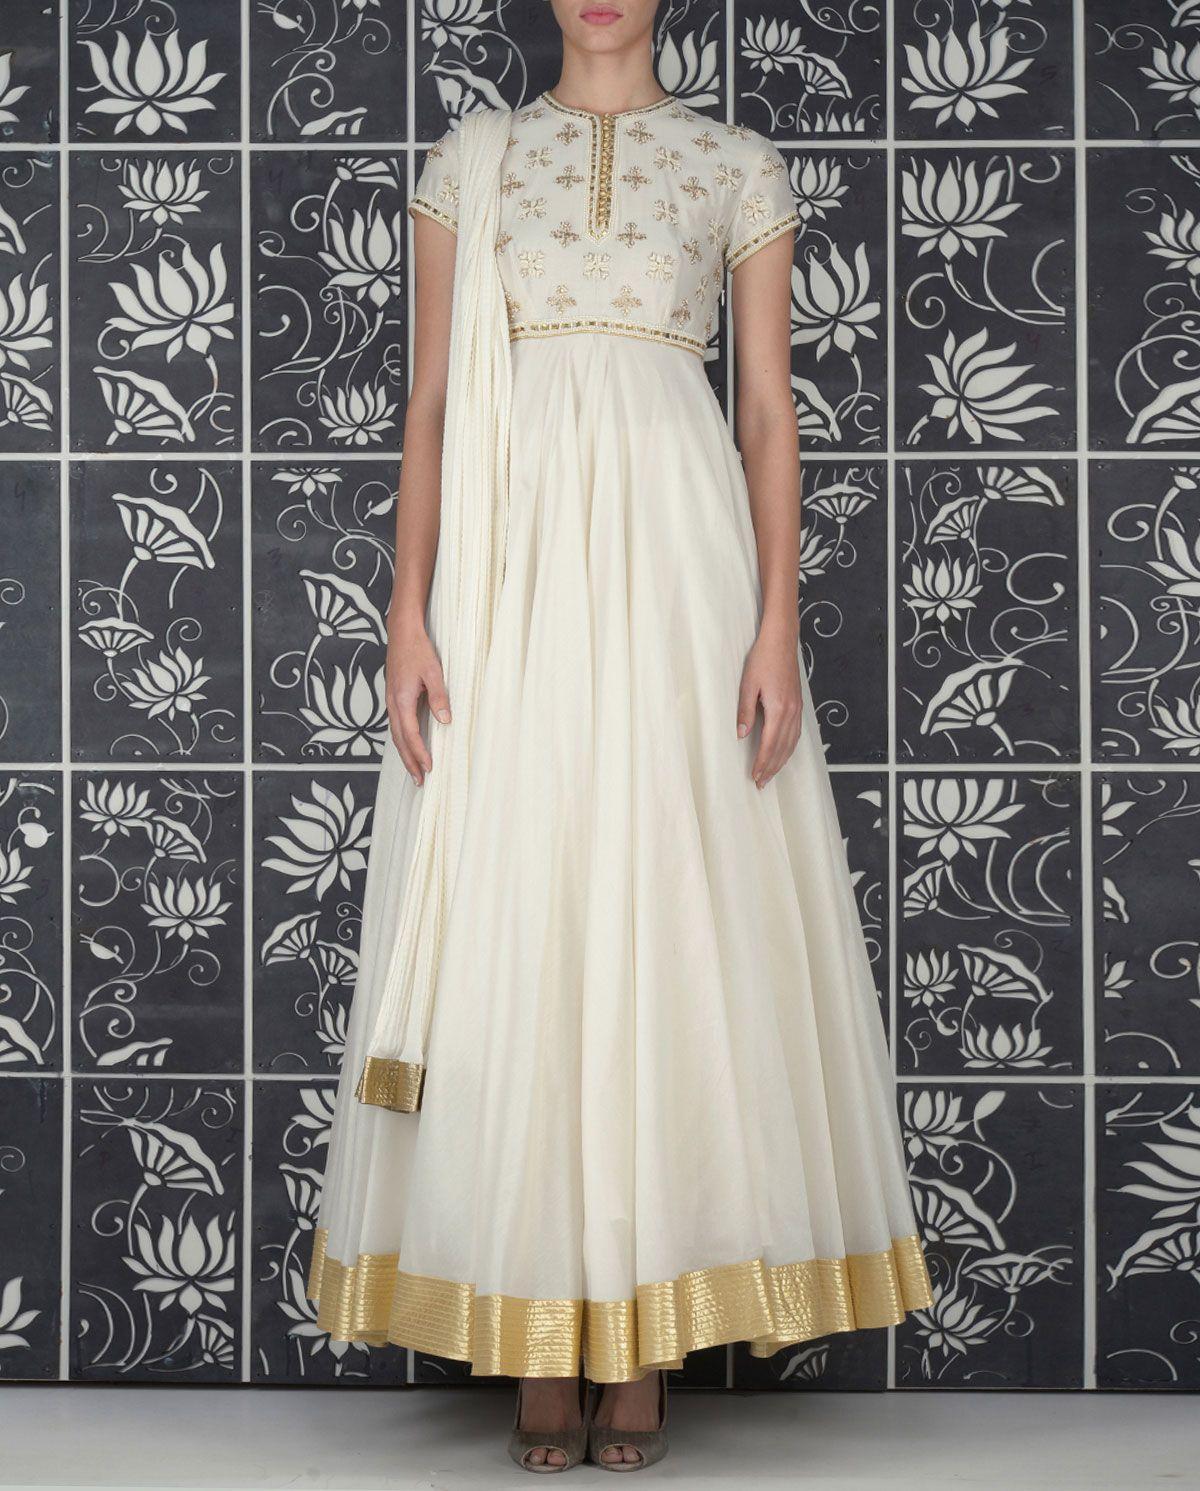 38b7875463 Rohit Bal Ivory Anarkali Suit with Embellished Yoke   kerala half ...